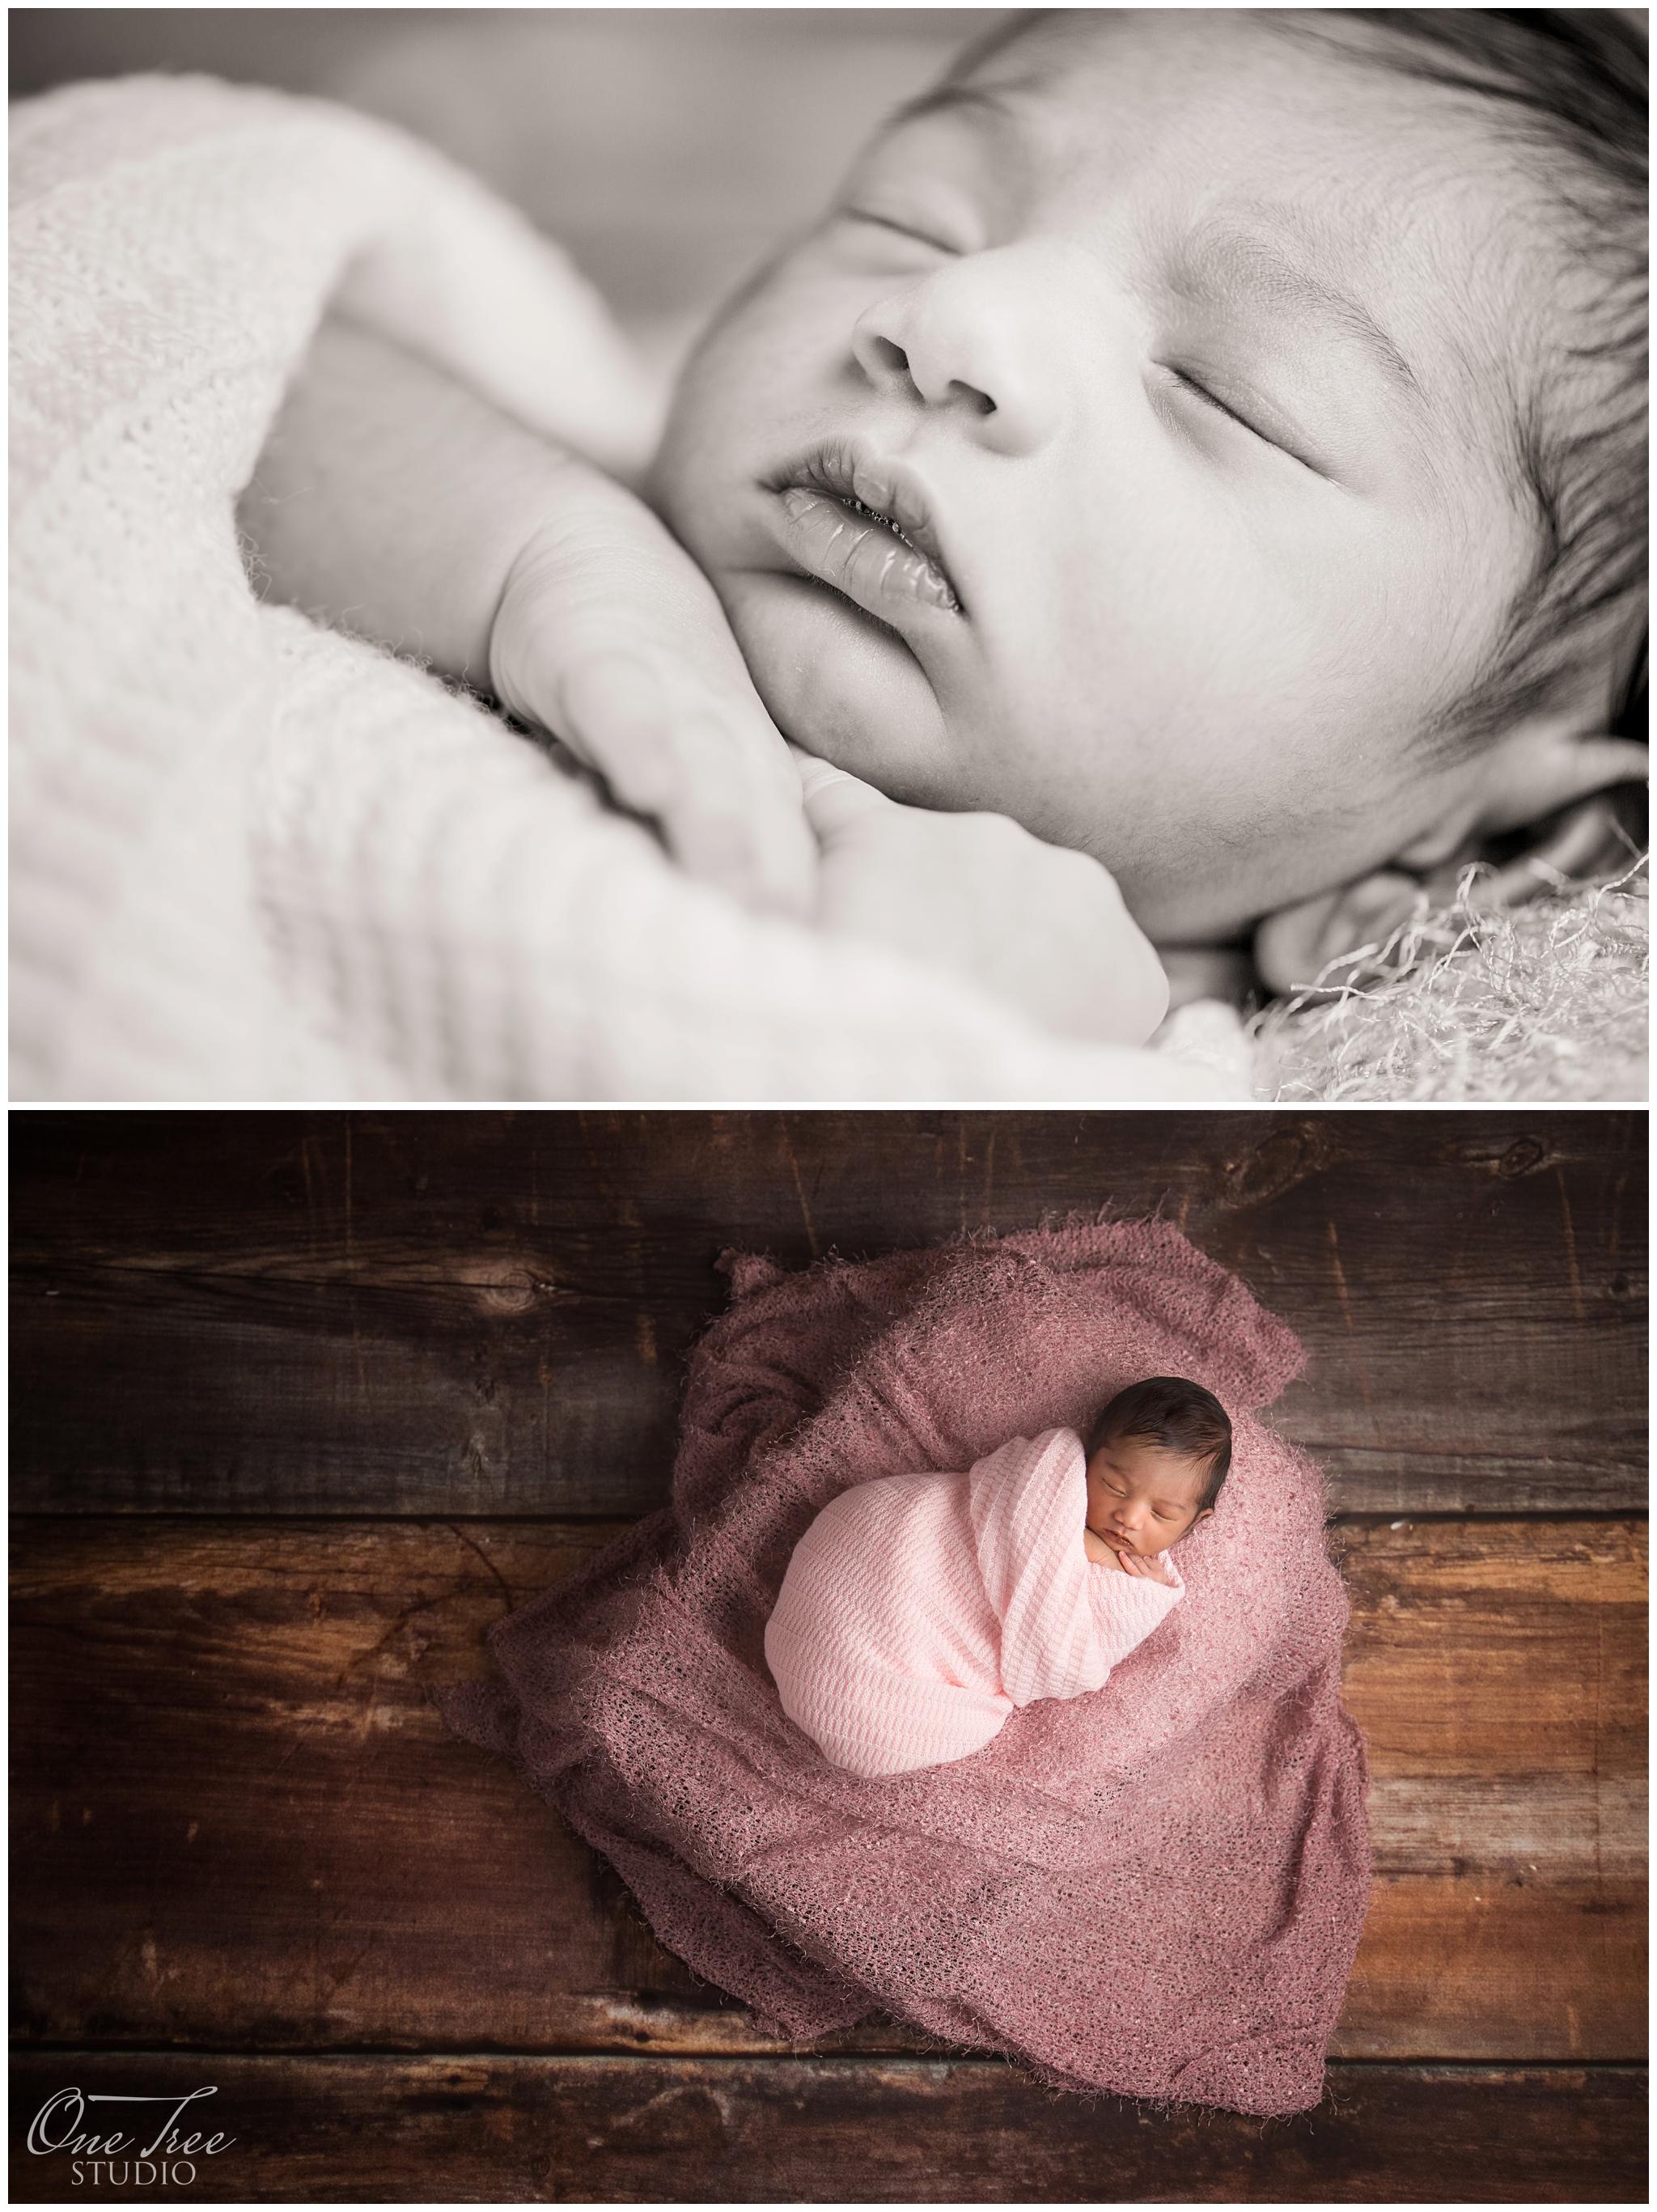 © One Tree Studio Inc. | Newborn Photography | Markham